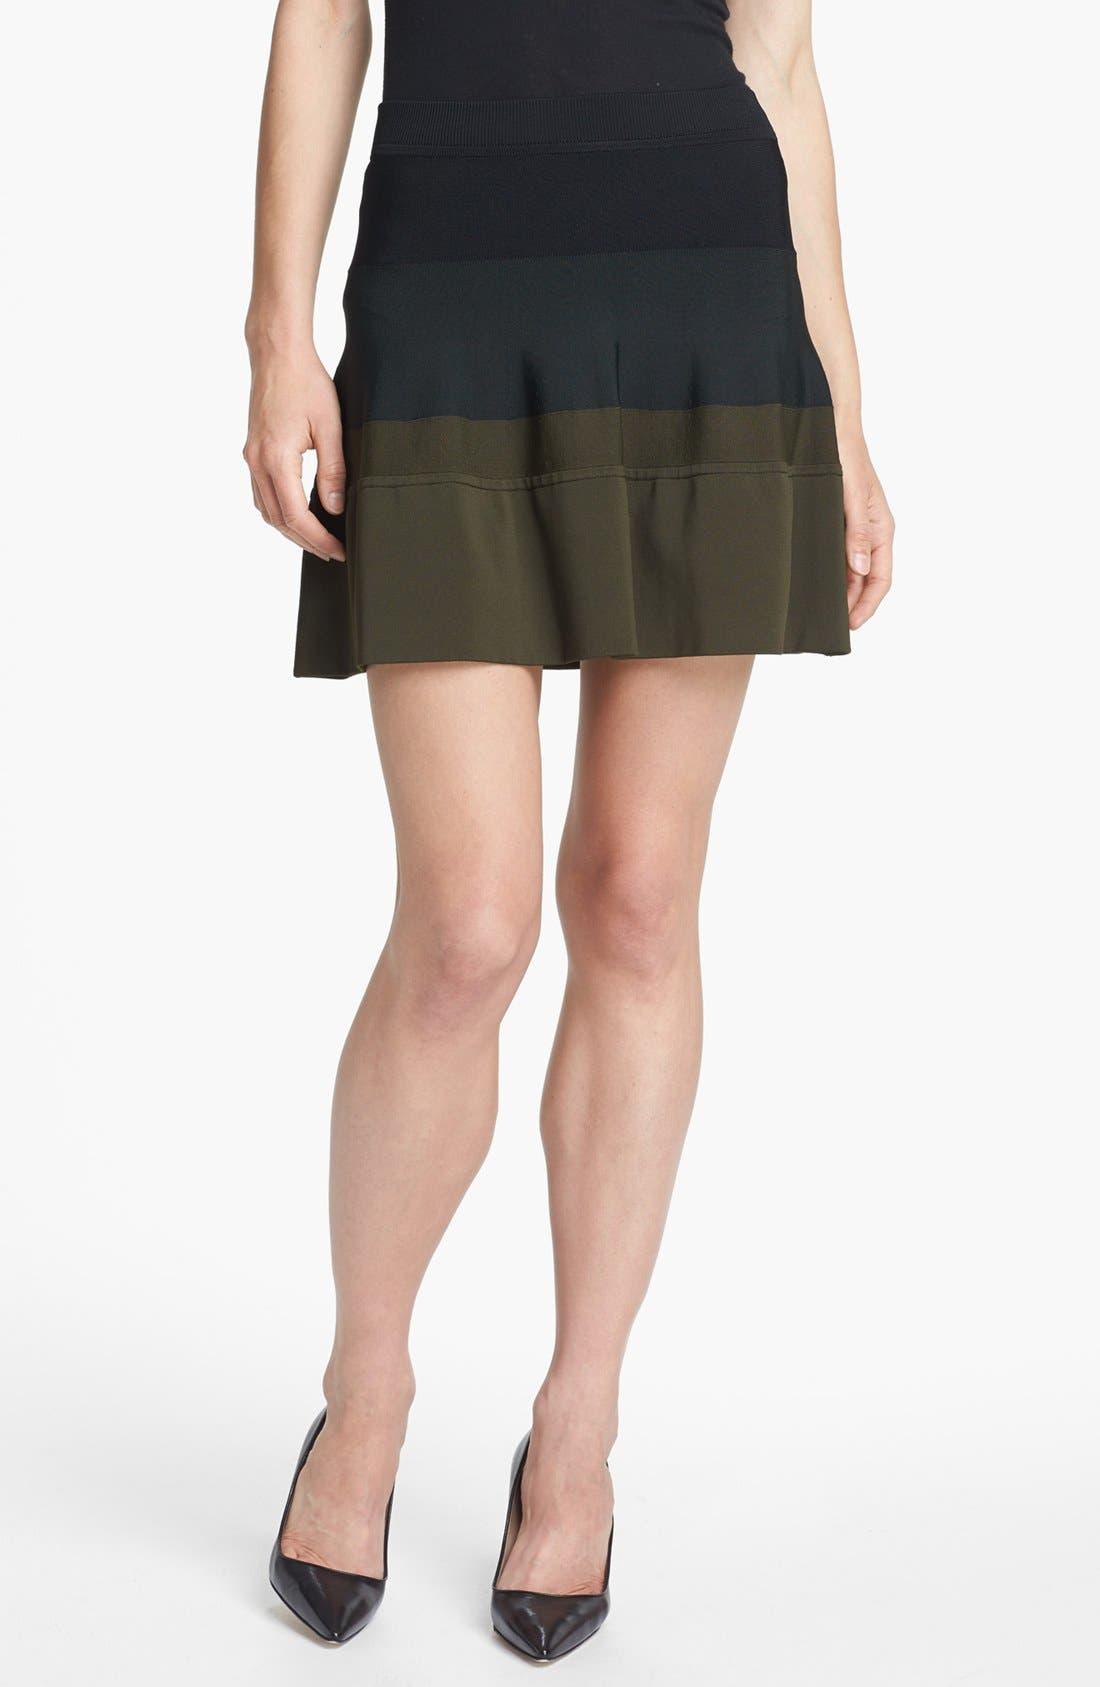 Alternate Image 1 Selected - A.L.C. 'Natalia' Colorblock Skirt